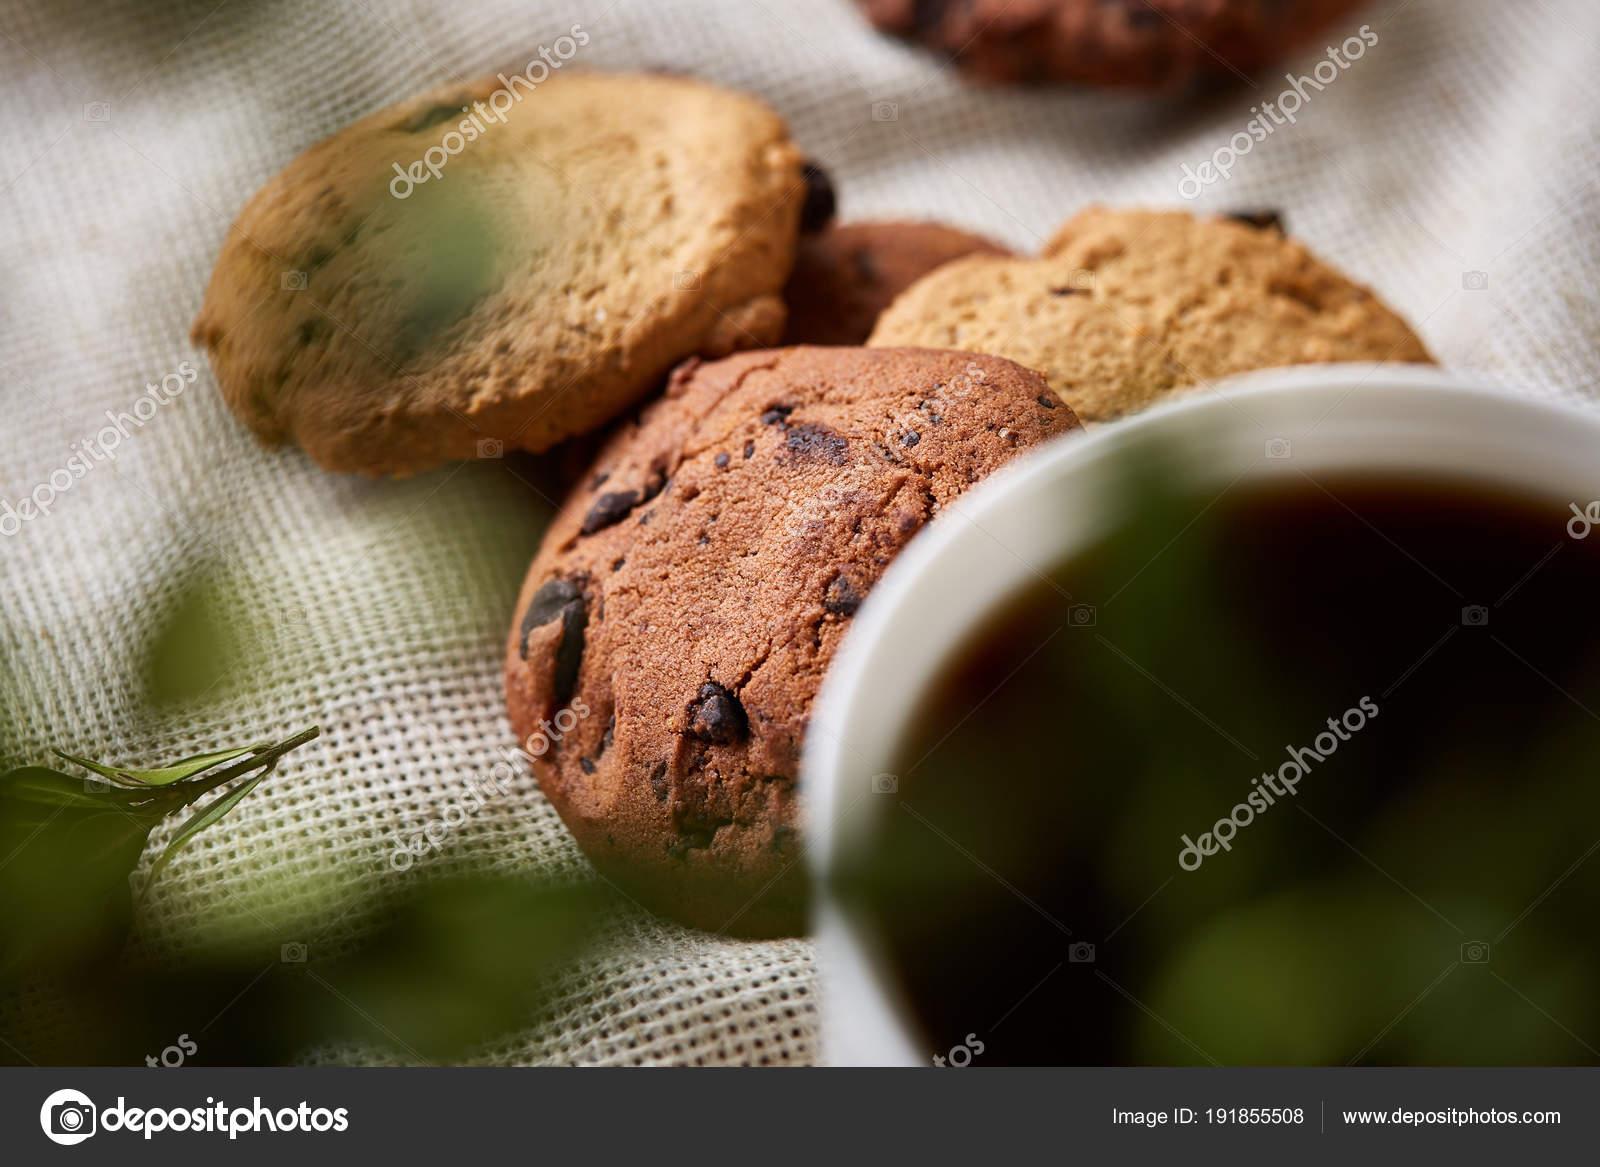 Breakfast Background With Mug Of Fresh Coffee Homemade Oatmeal Cookies Grind Coffee Stock Photo C Aleksey Rezin 191855508